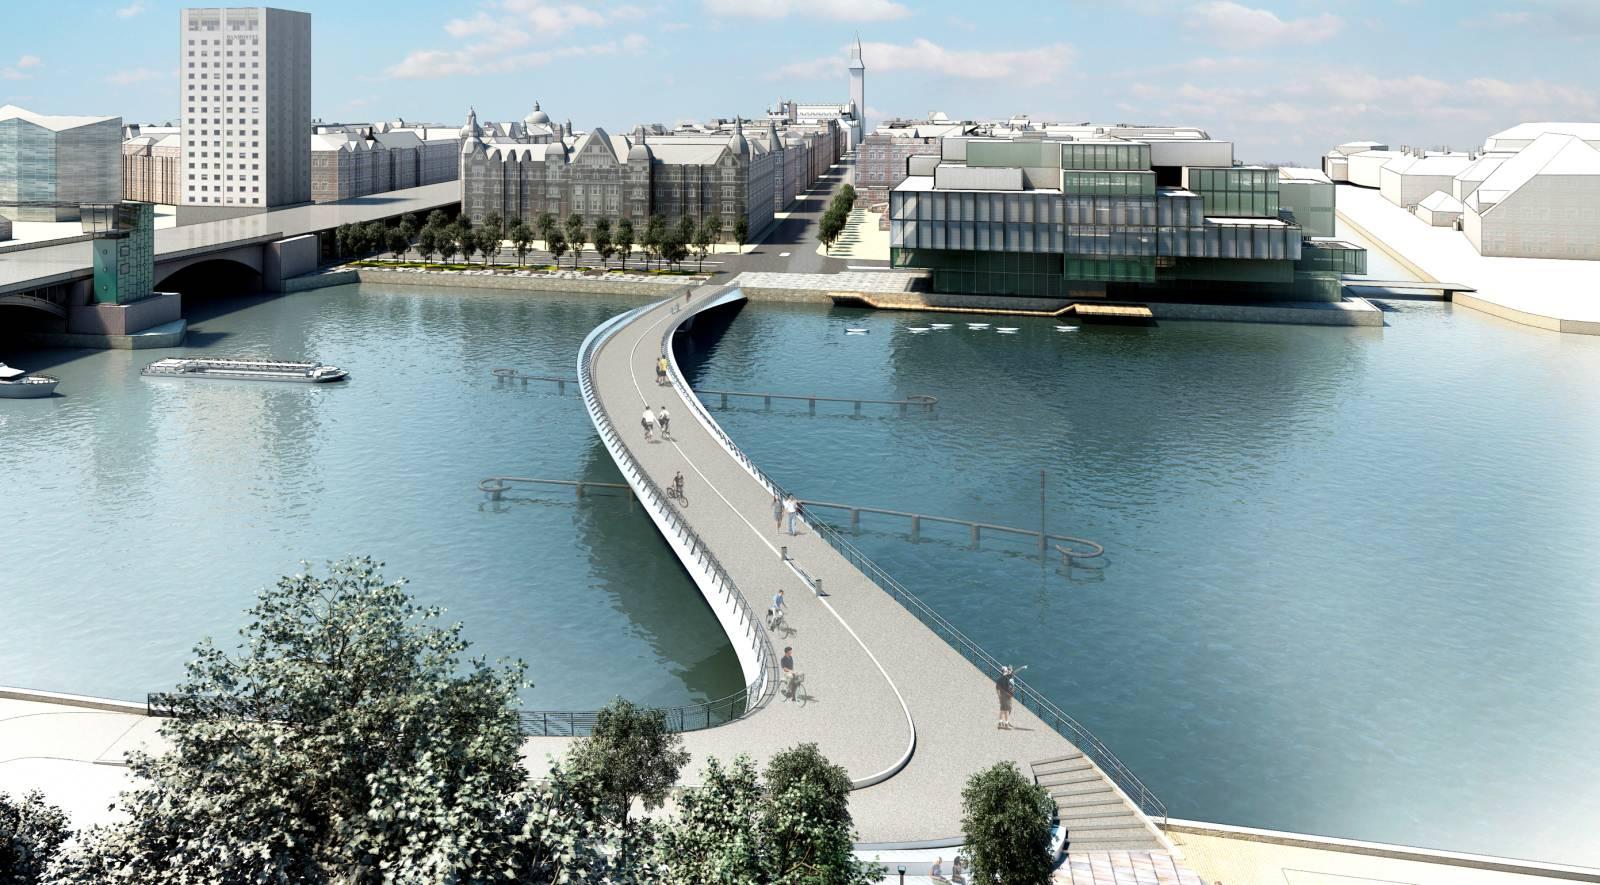 new bridge in central Copenhage